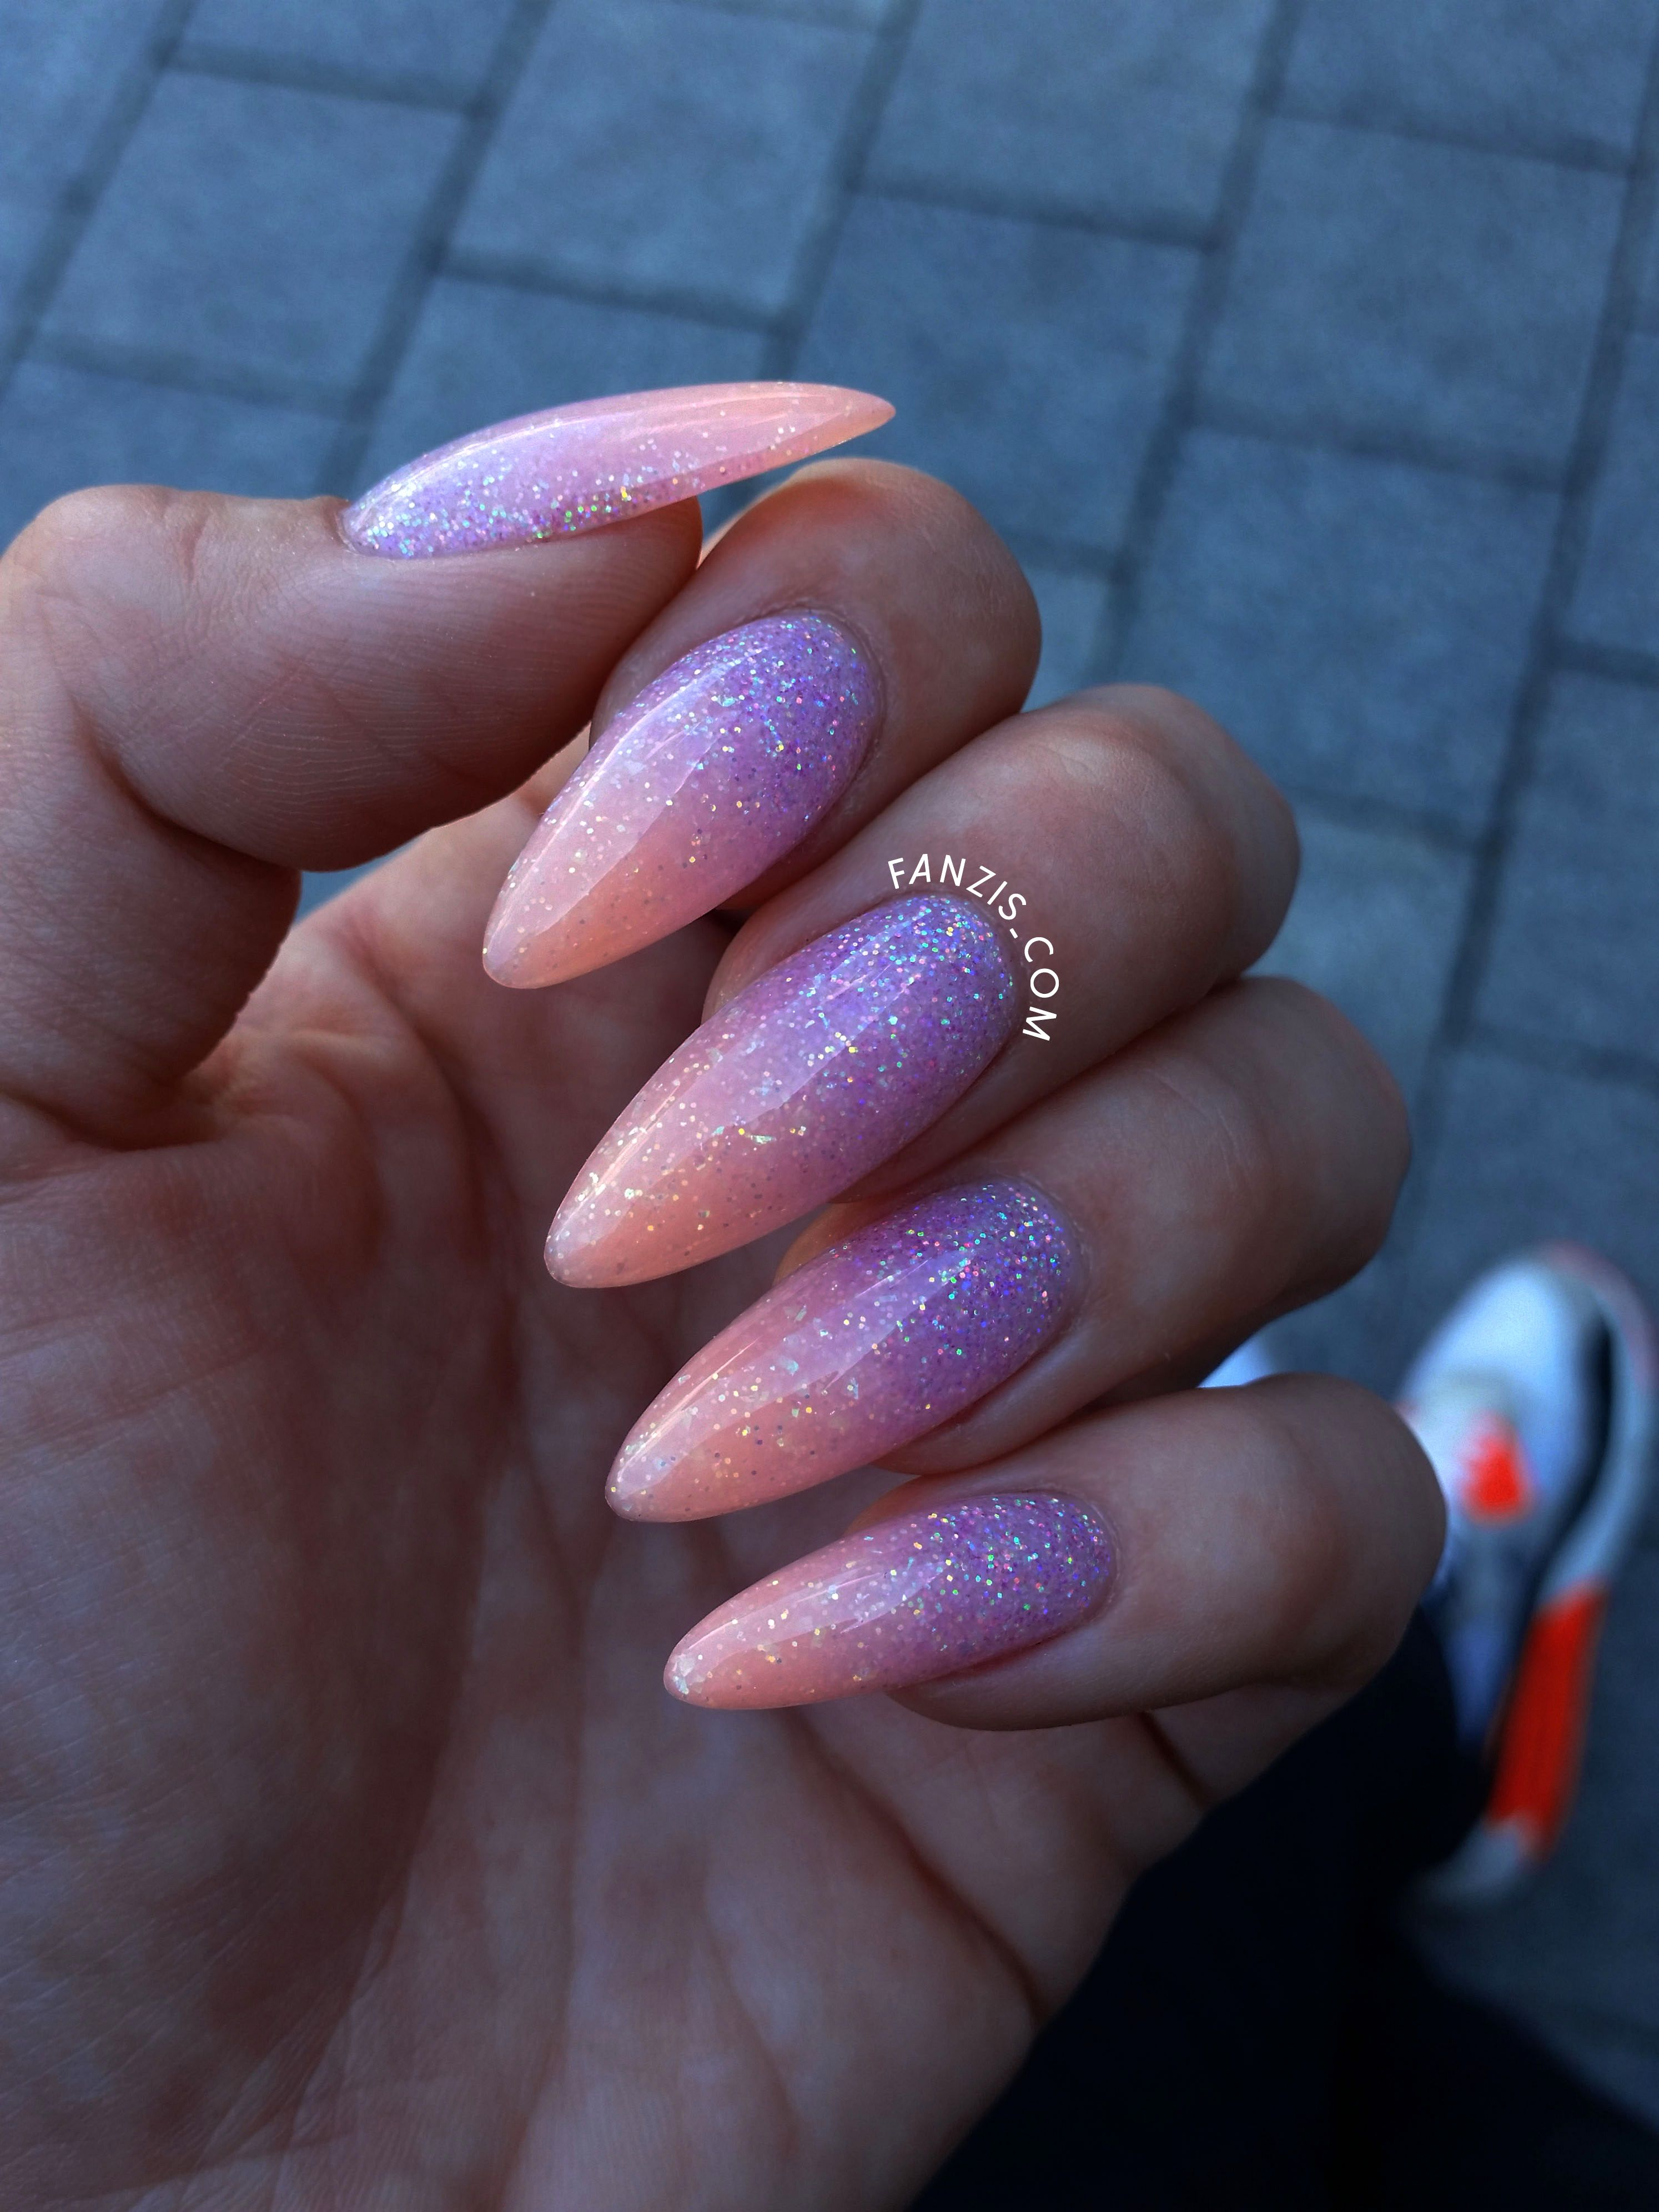 Neon Ombre Glitter Nails Napady Na Nechty Letne Nechty